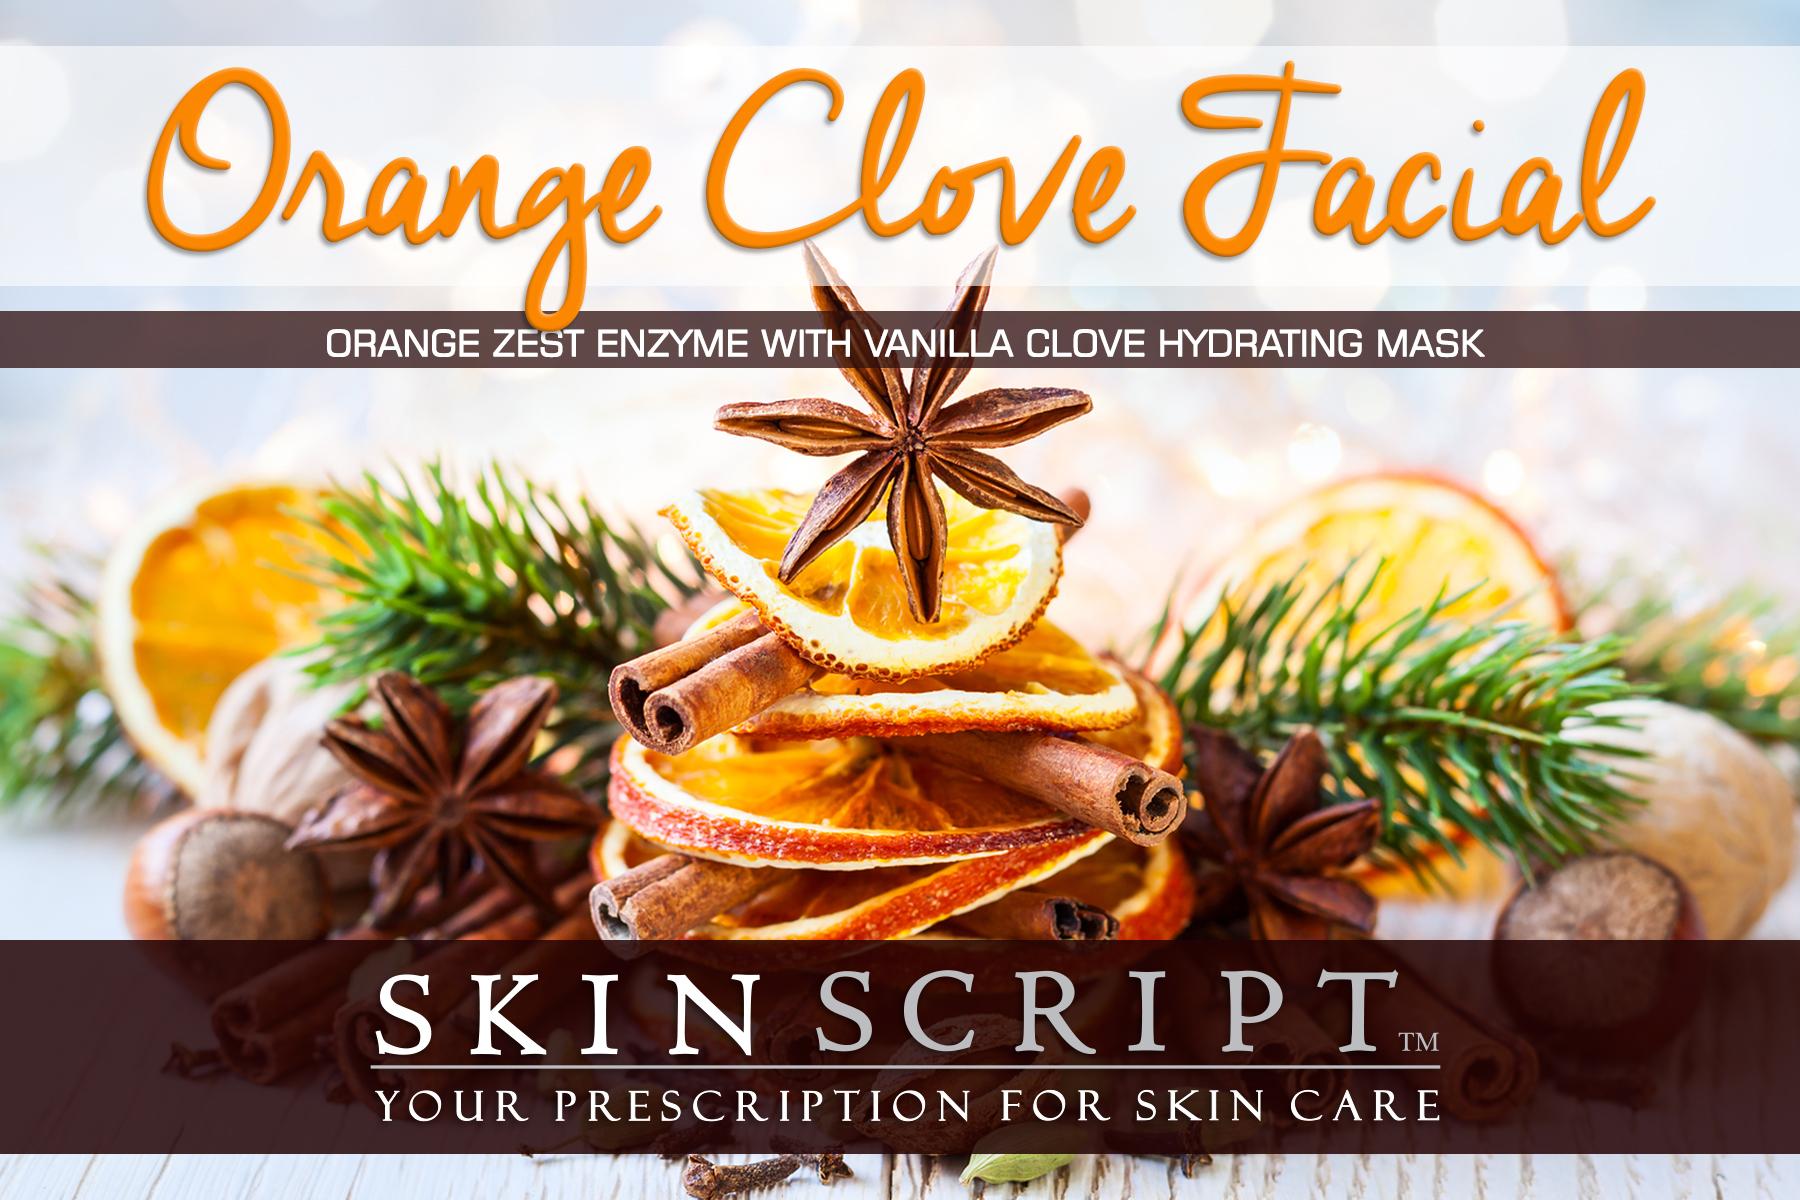 Orange Clove Facial_4x6_2_HR.jpg